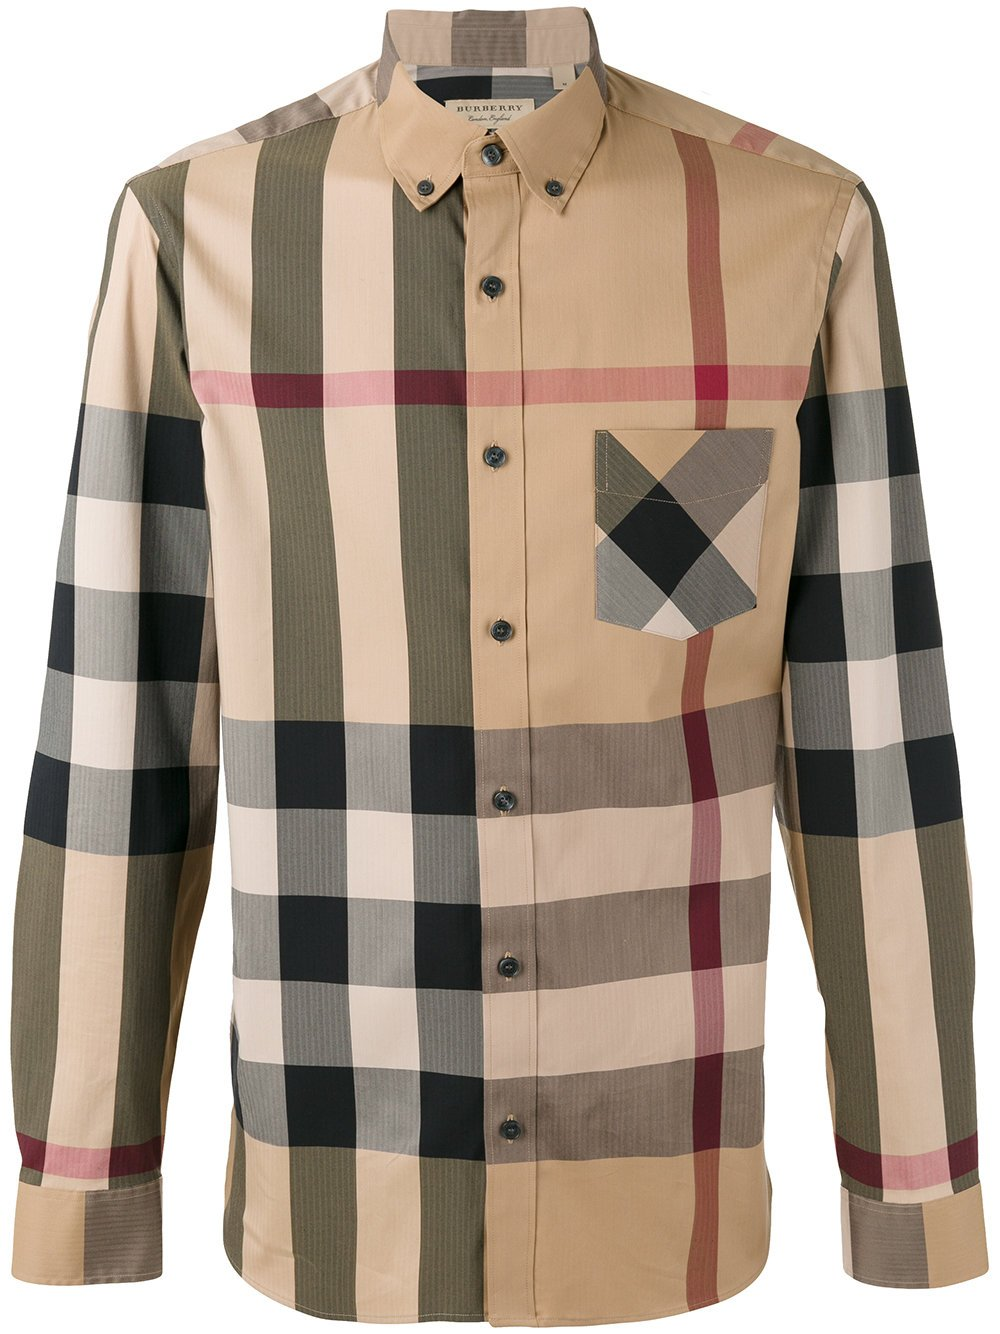 BURBERRY Men's Thornaby Camel Check Shirt XXL